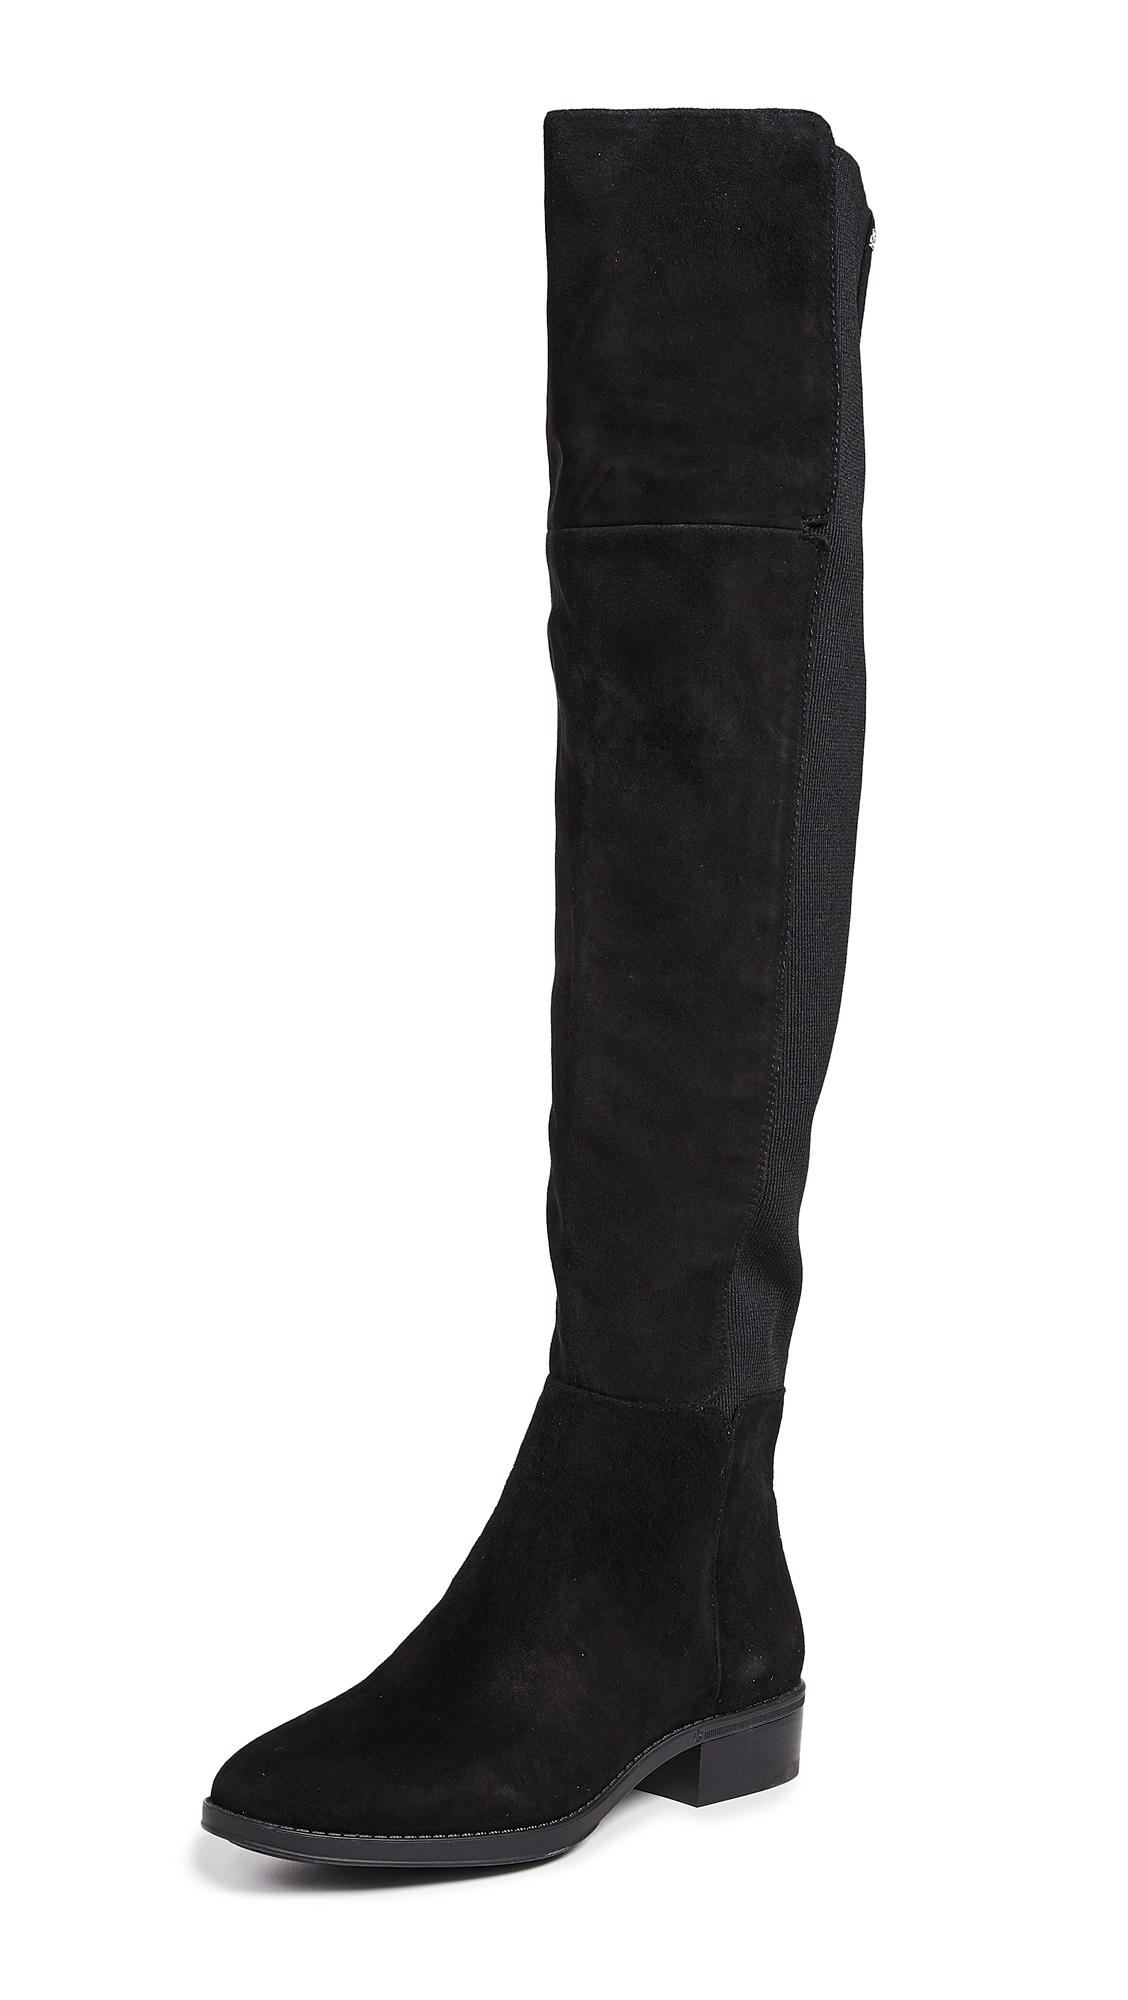 Sam Edelman Pam Boots - Black